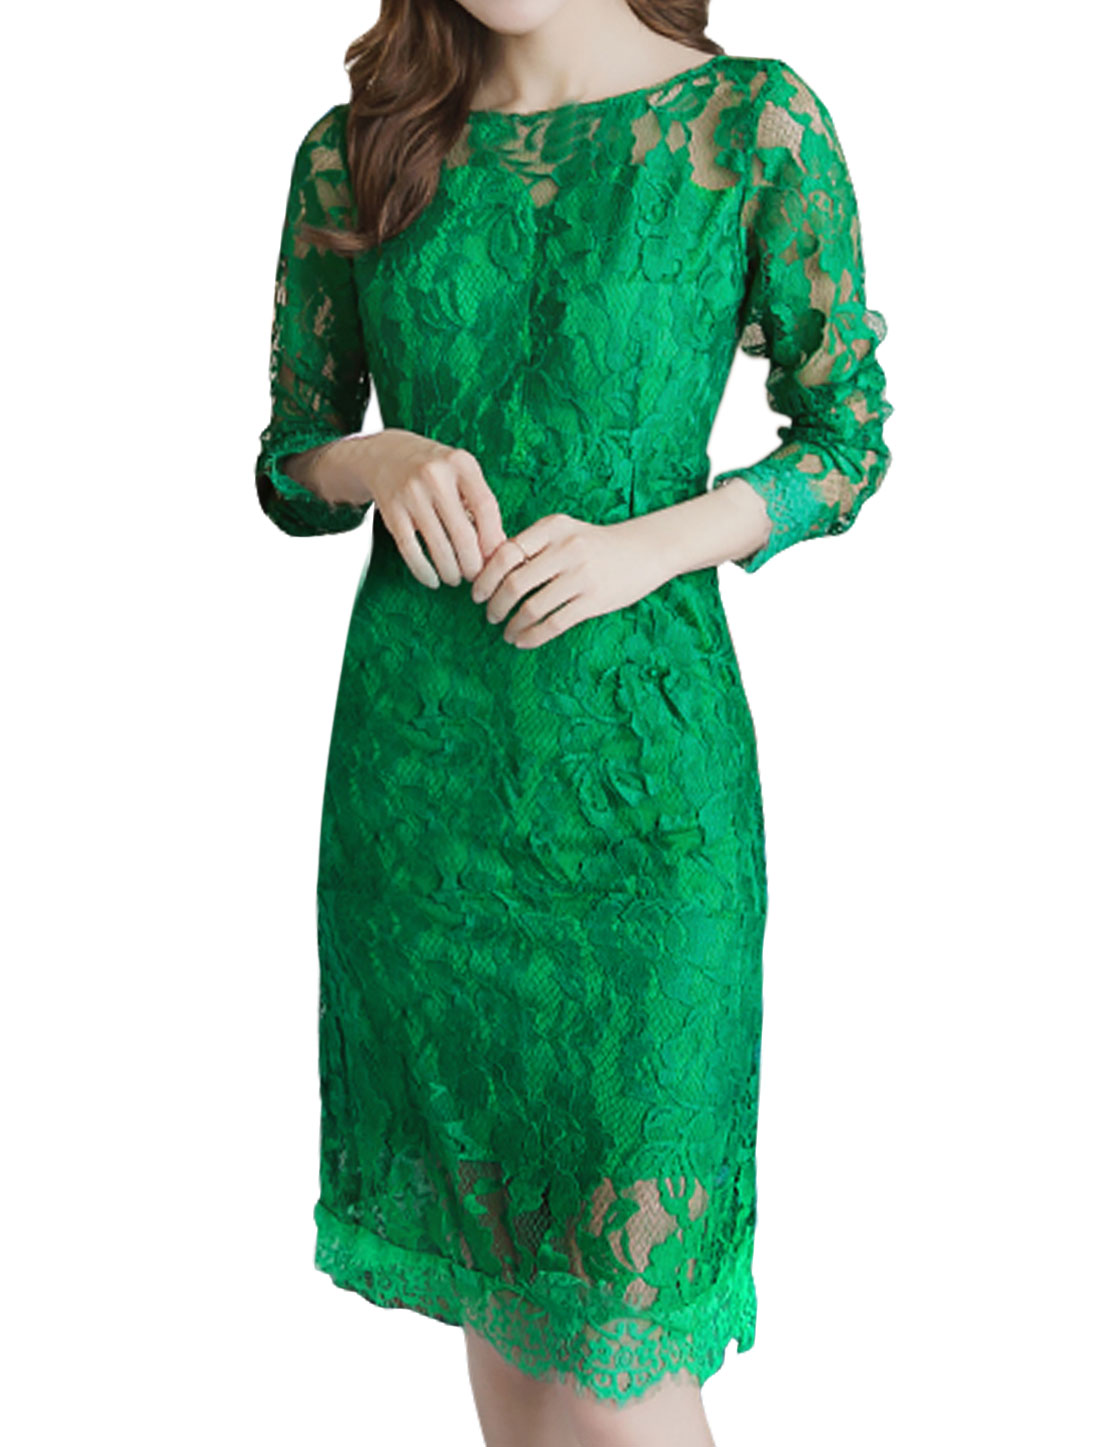 Women Semi Sheer Yoke Backless Floral Lace Sheath Dress Green S